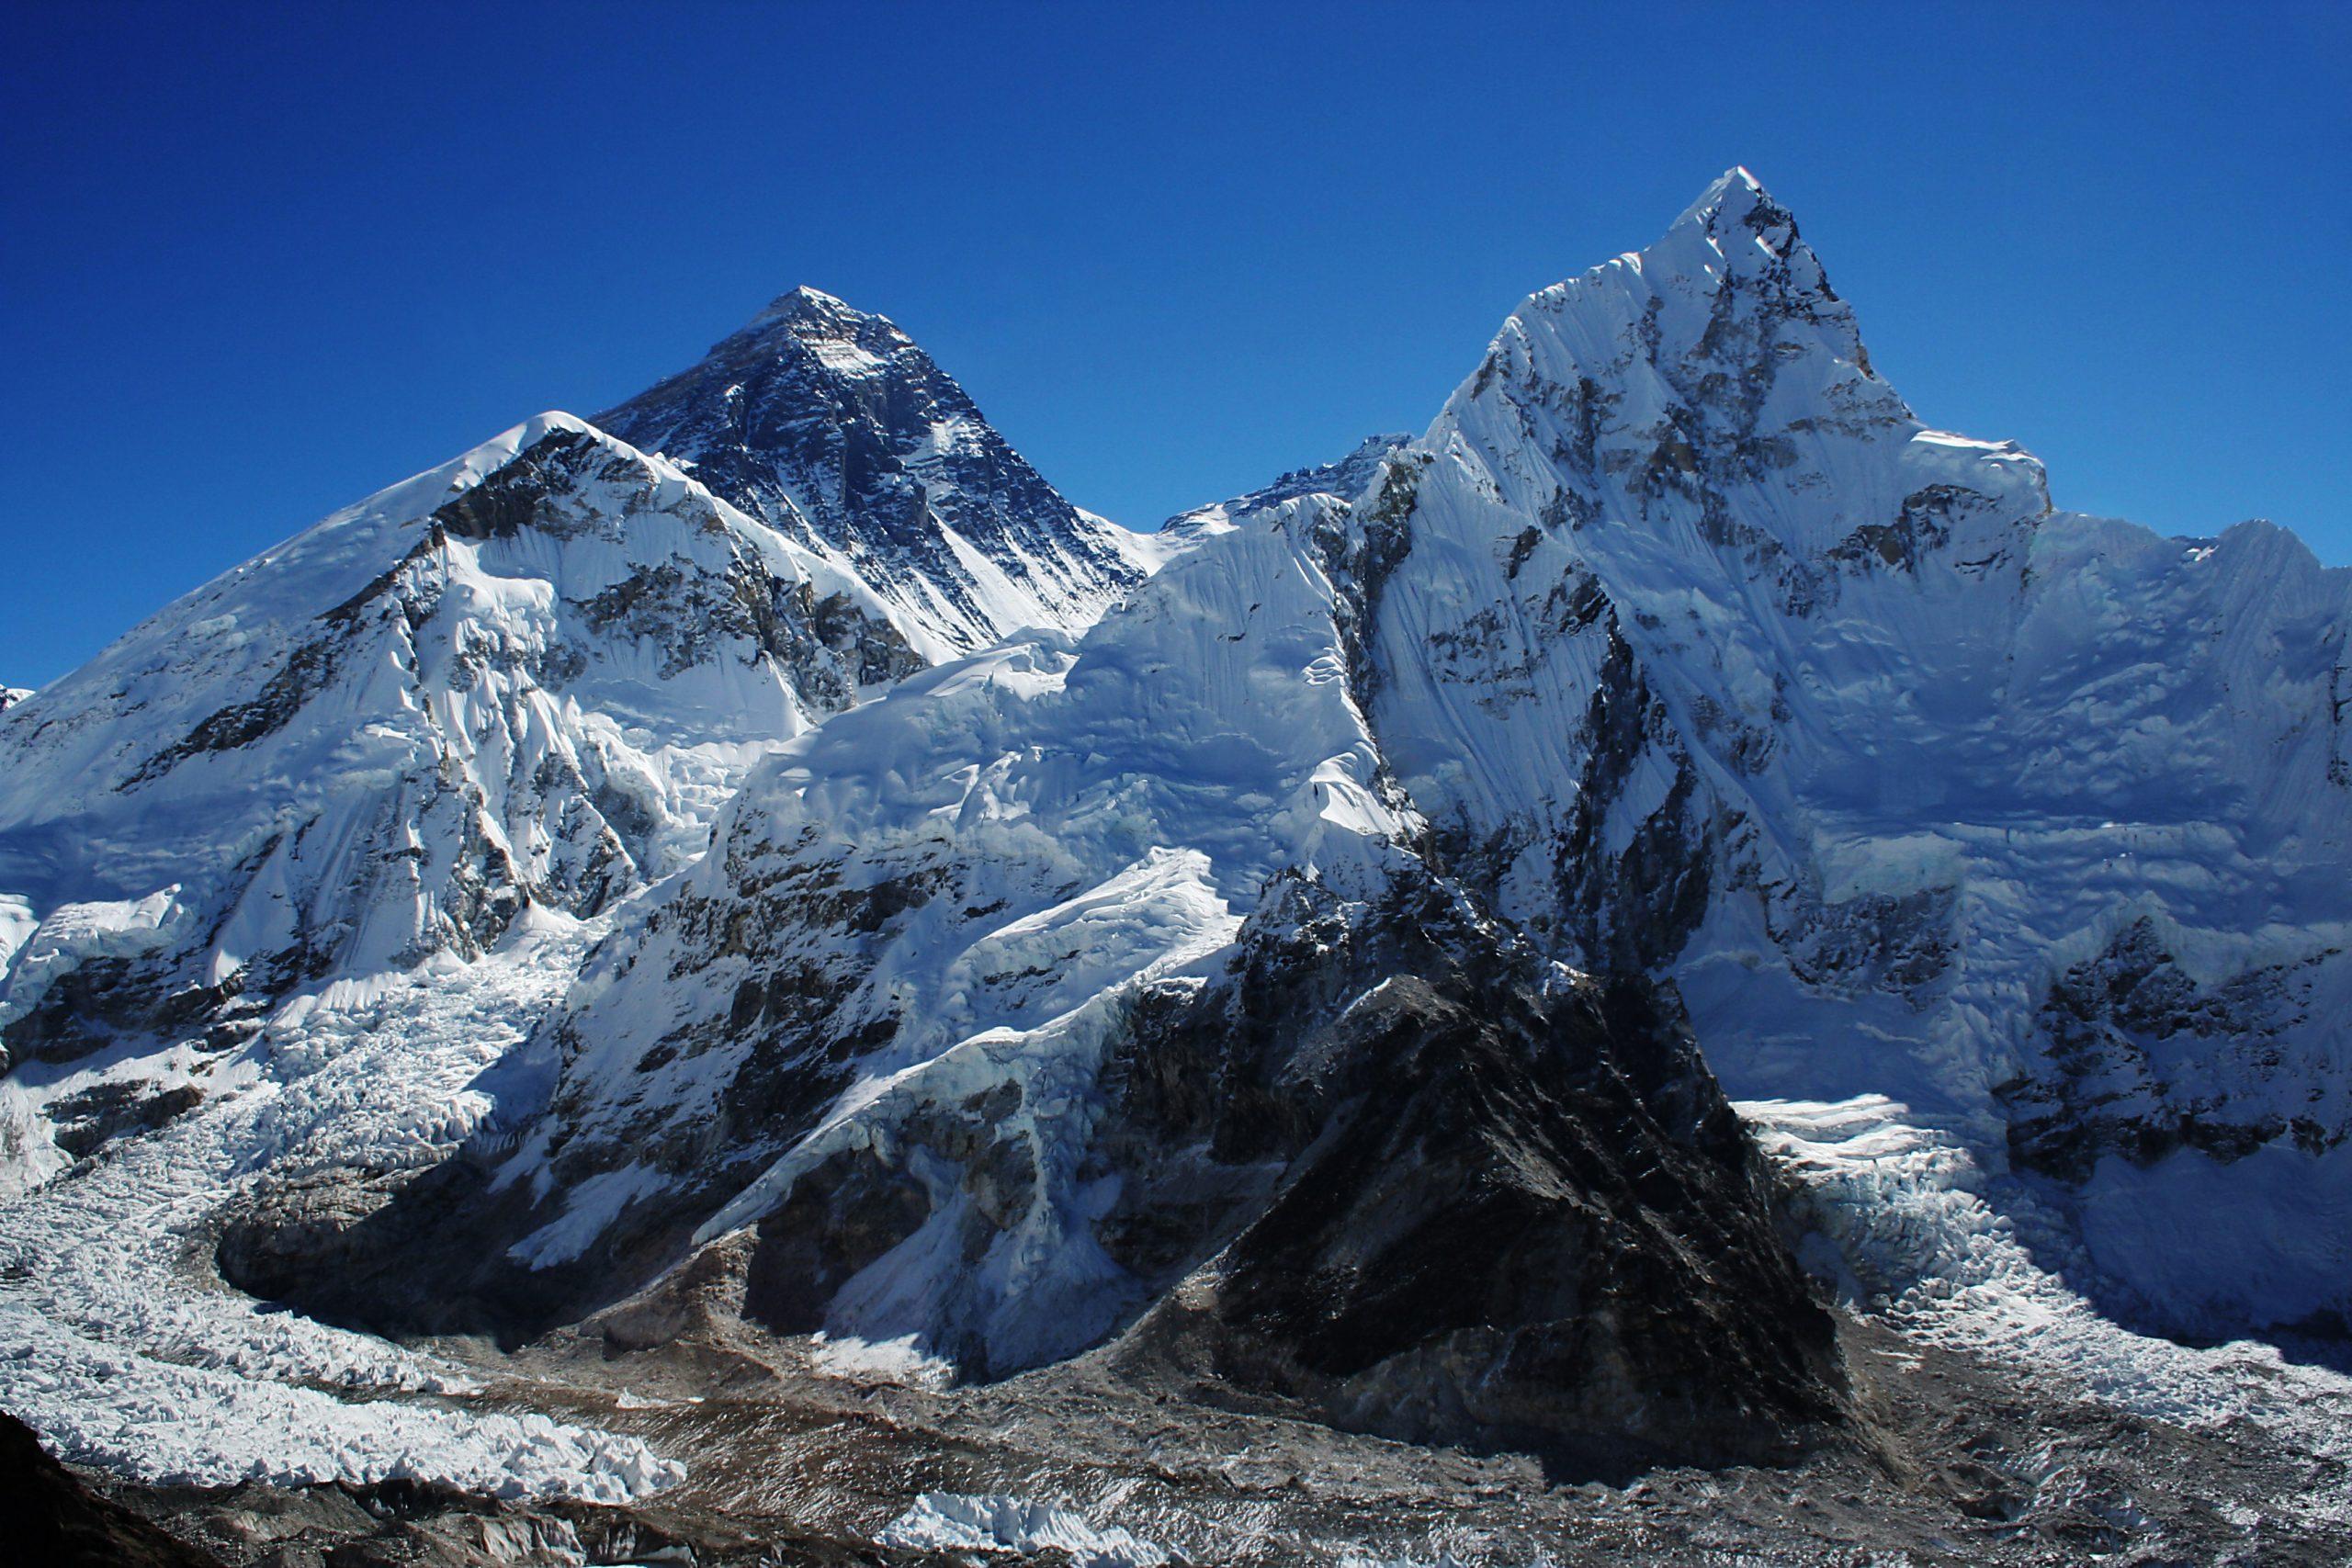 Imagen del Monte Everest